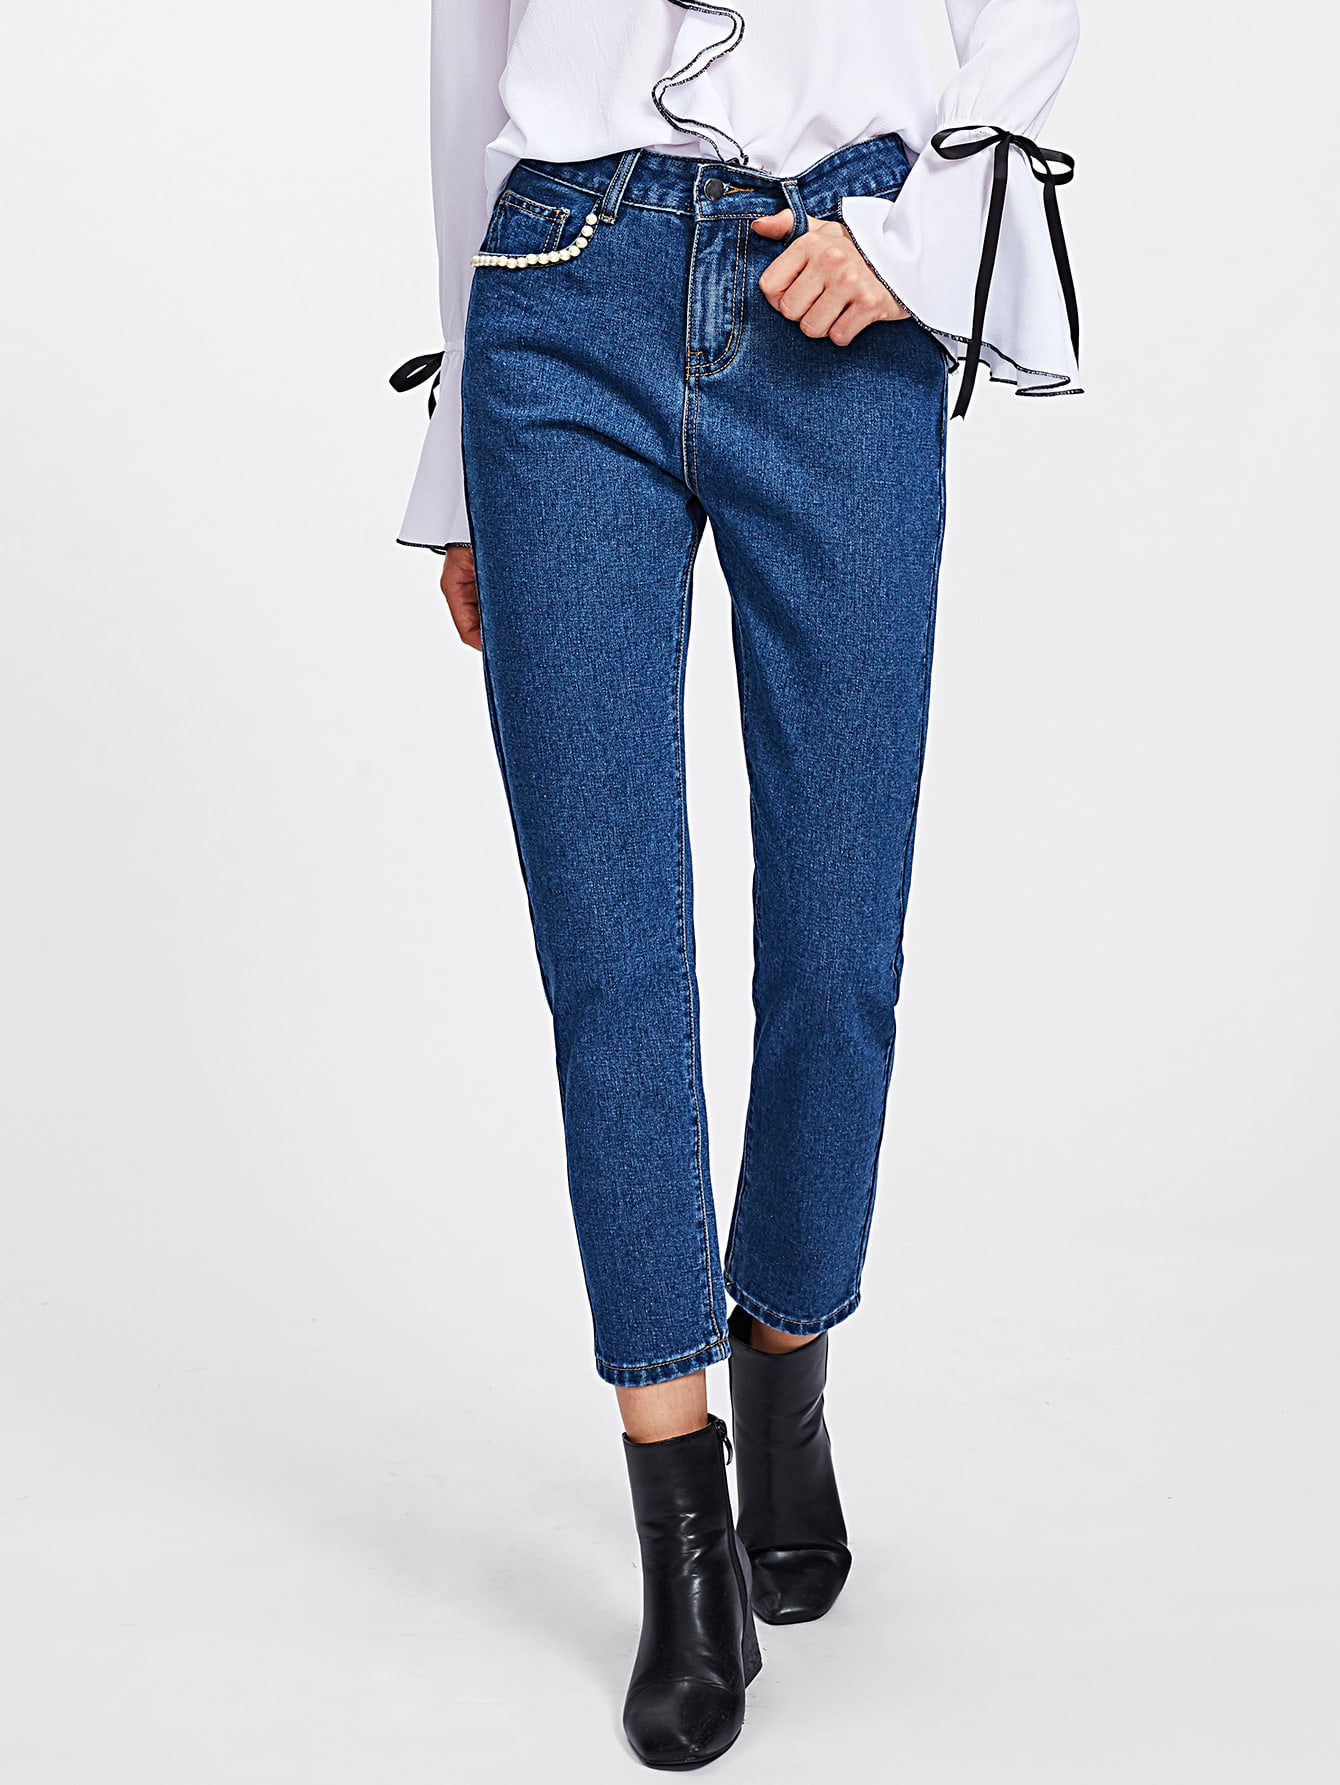 Pearl Beading Pocket Peg Jeans